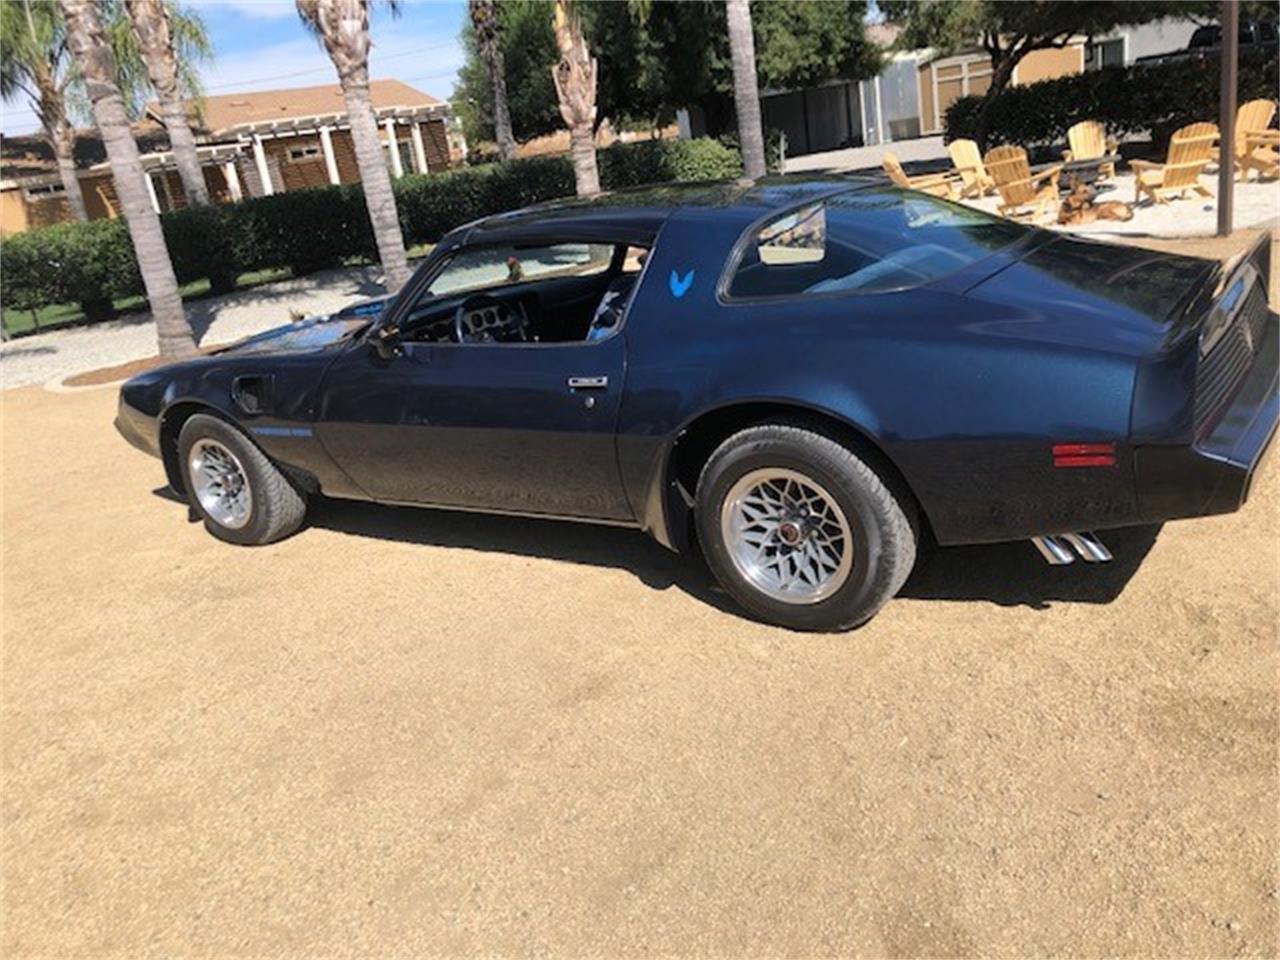 1981 Pontiac Firebird Trans Am (CC-1212106) for sale in Menifee, California